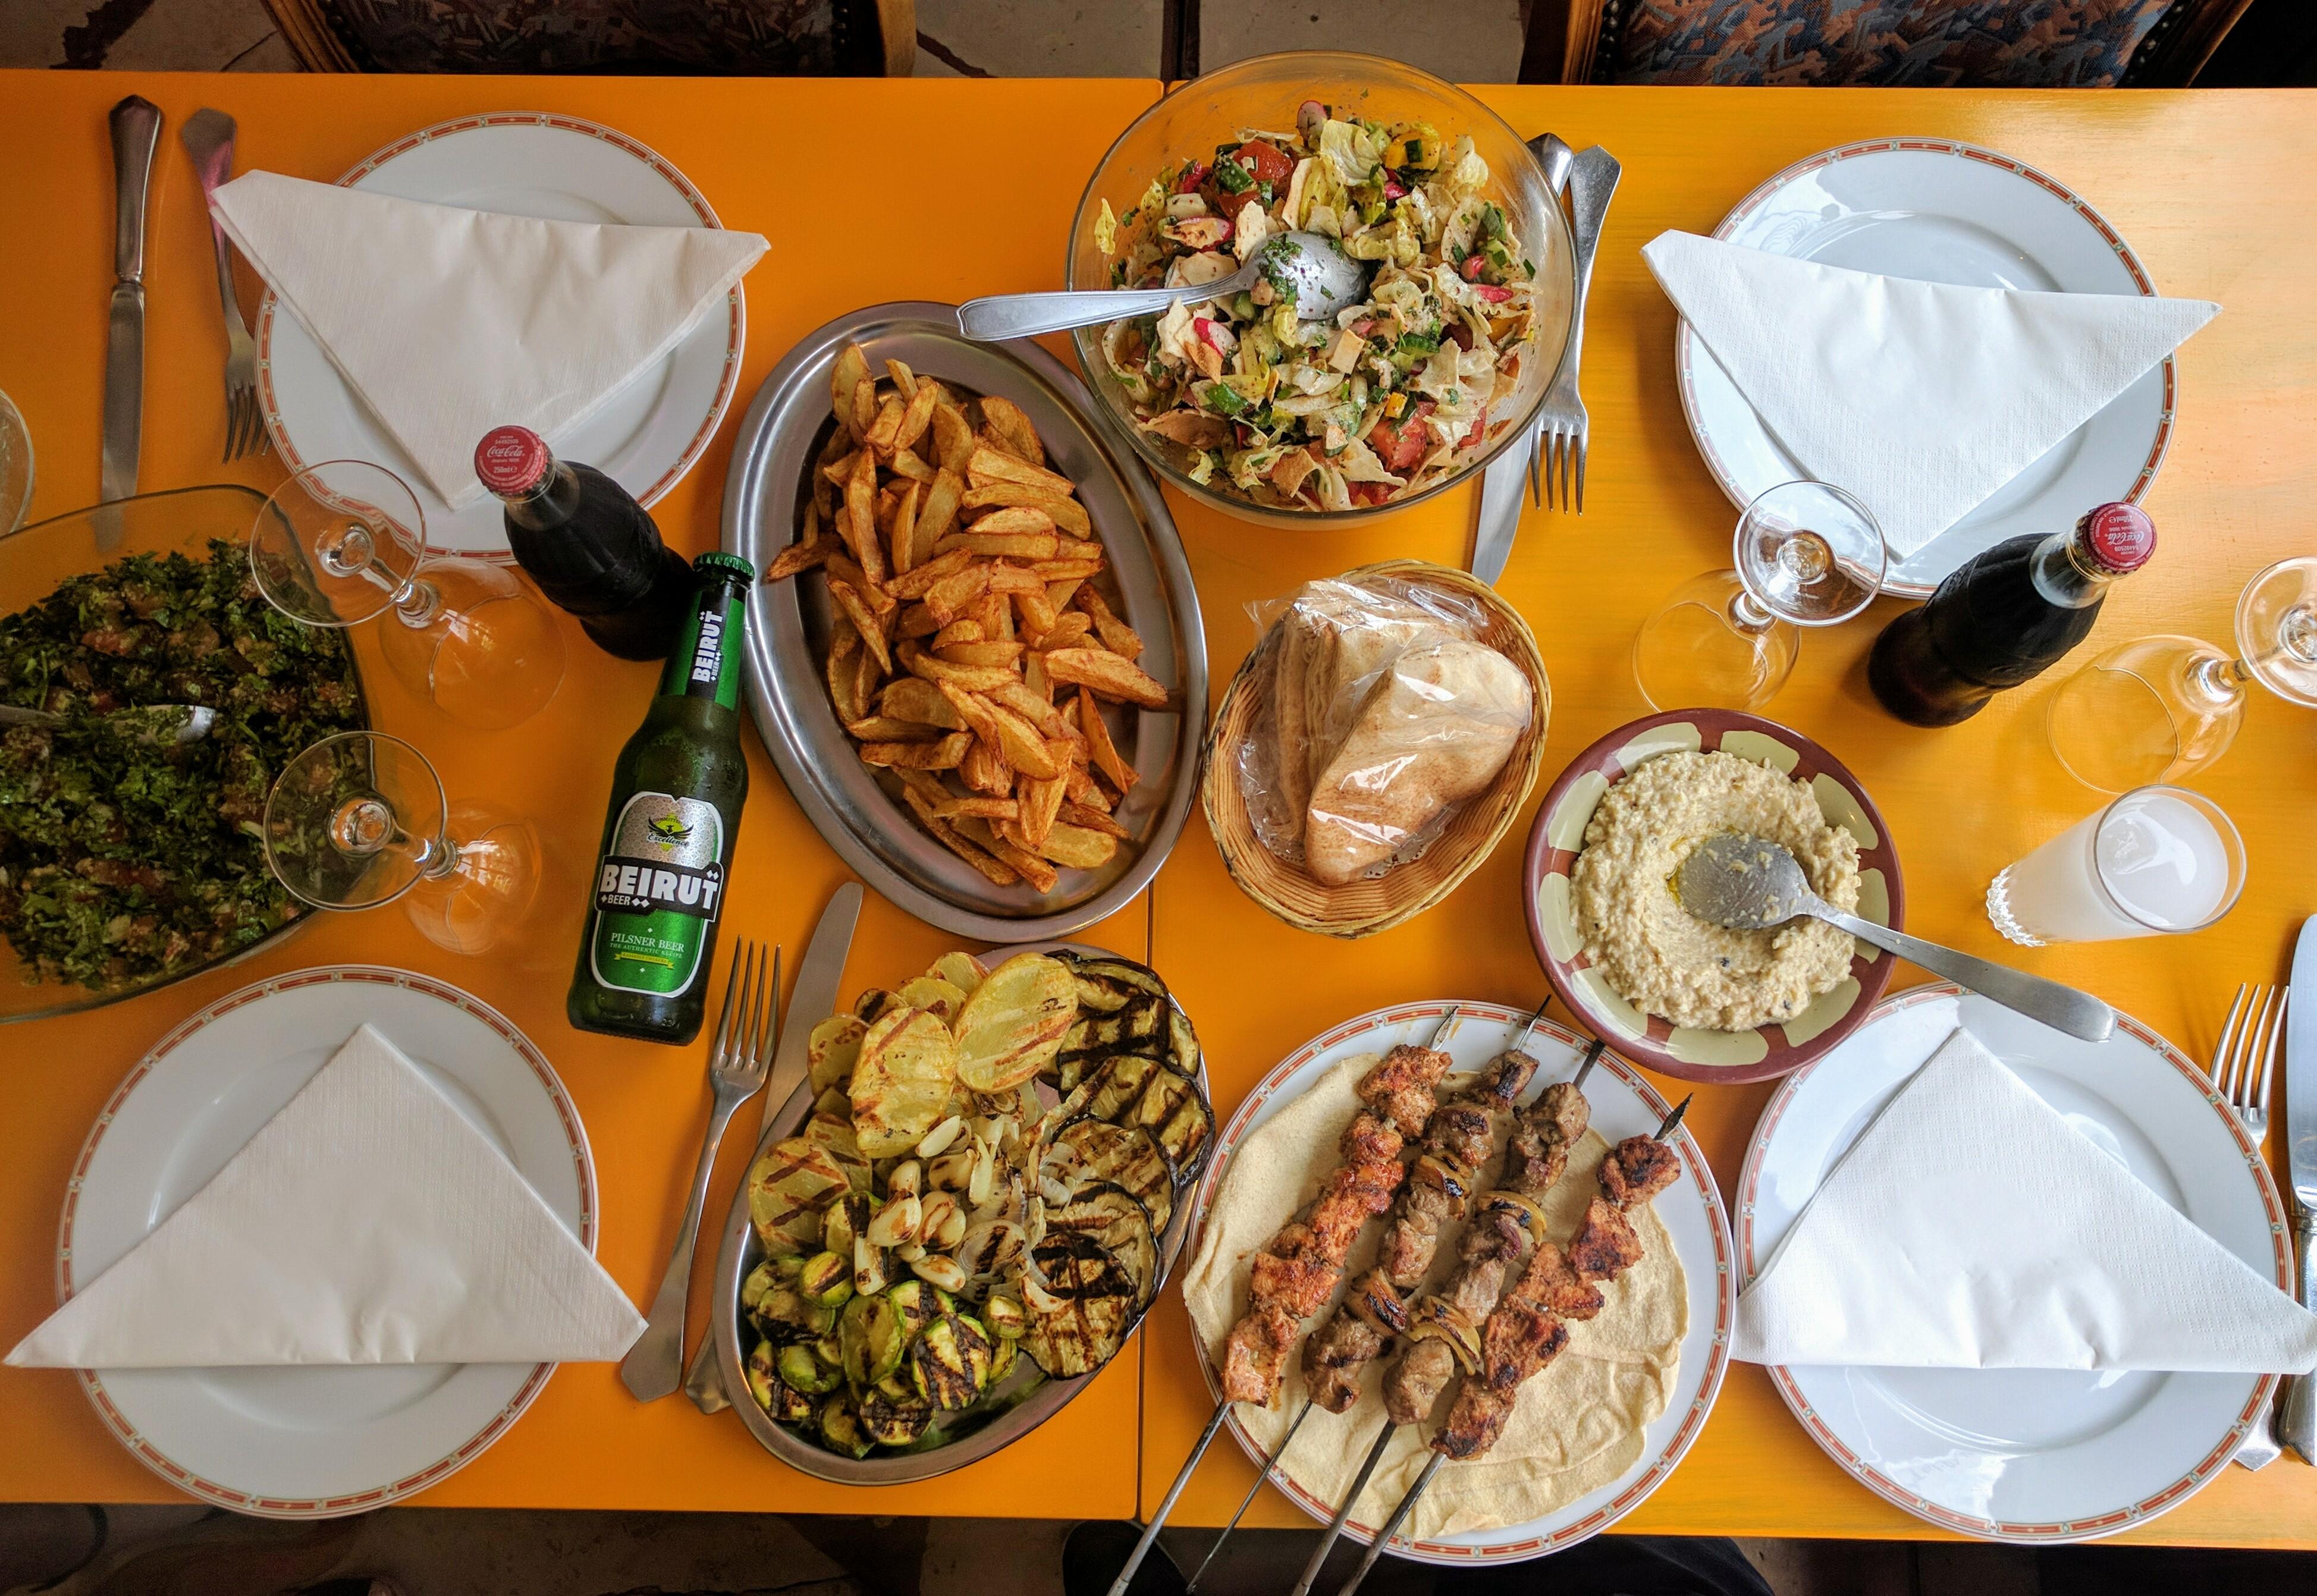 Restaurant libanais porte de versailles al fawar paris 15 me - Restaurant porte de versailles ...